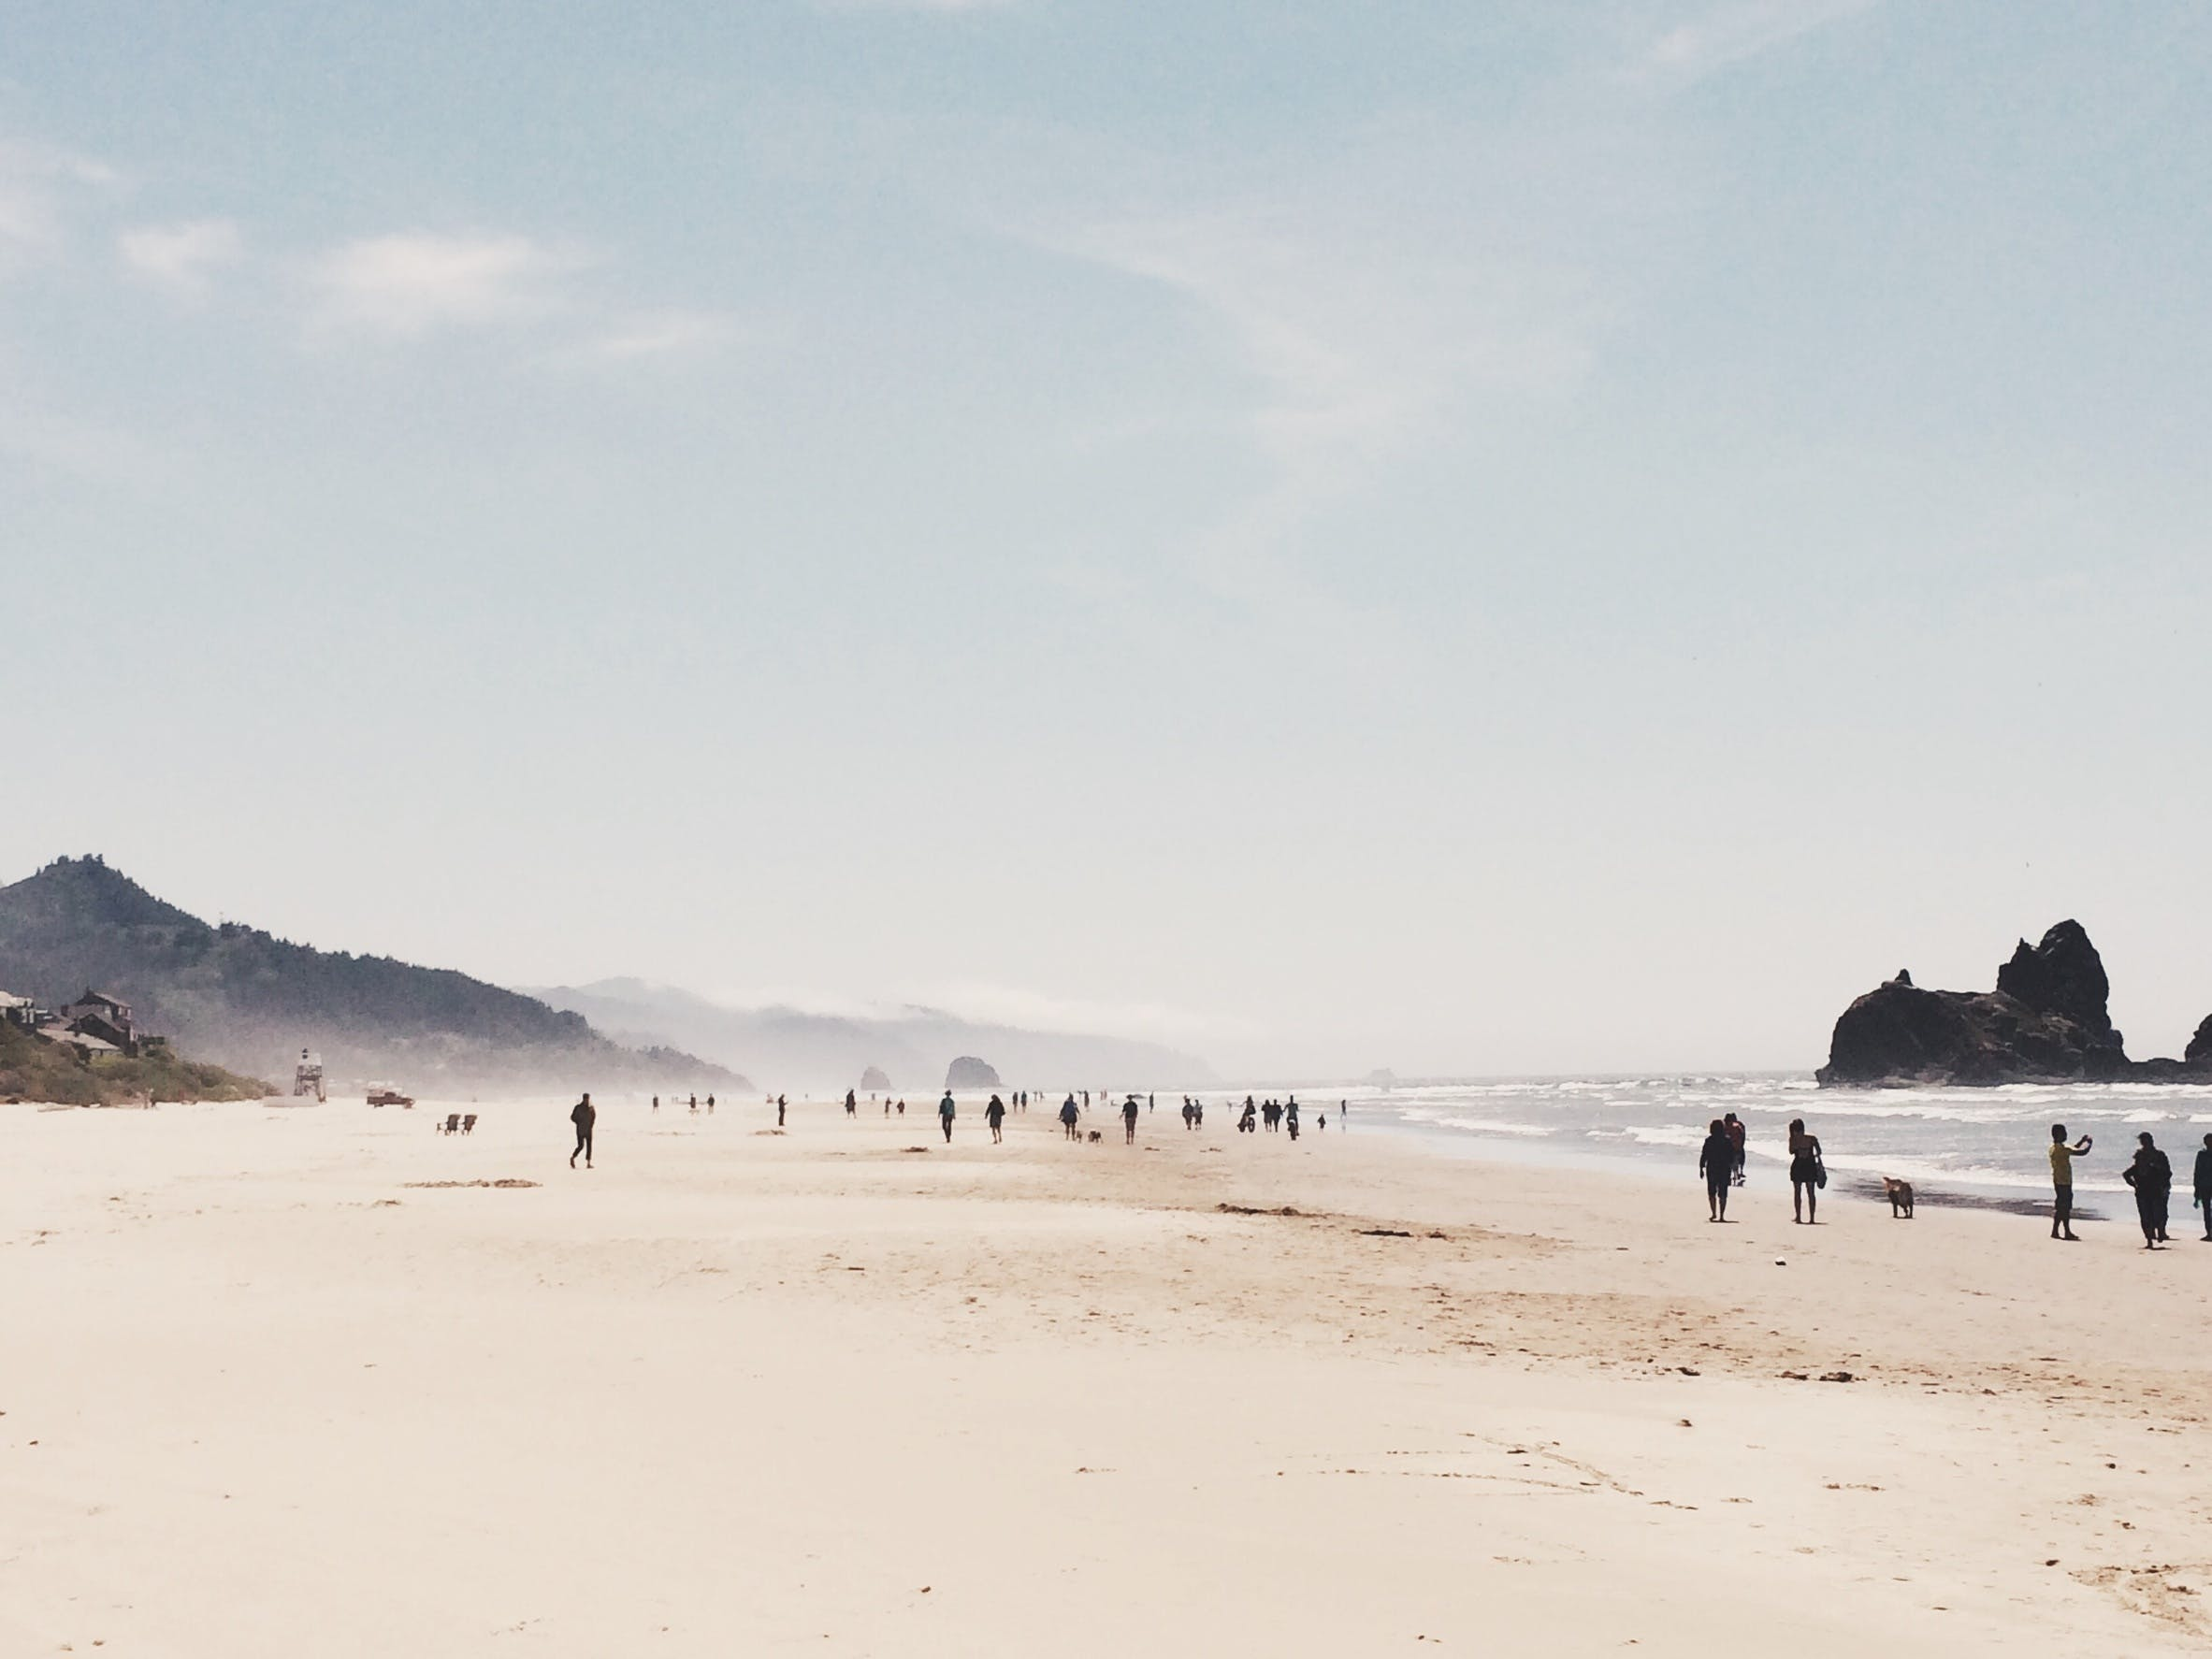 Free stock photo of sea, sky, beach, people